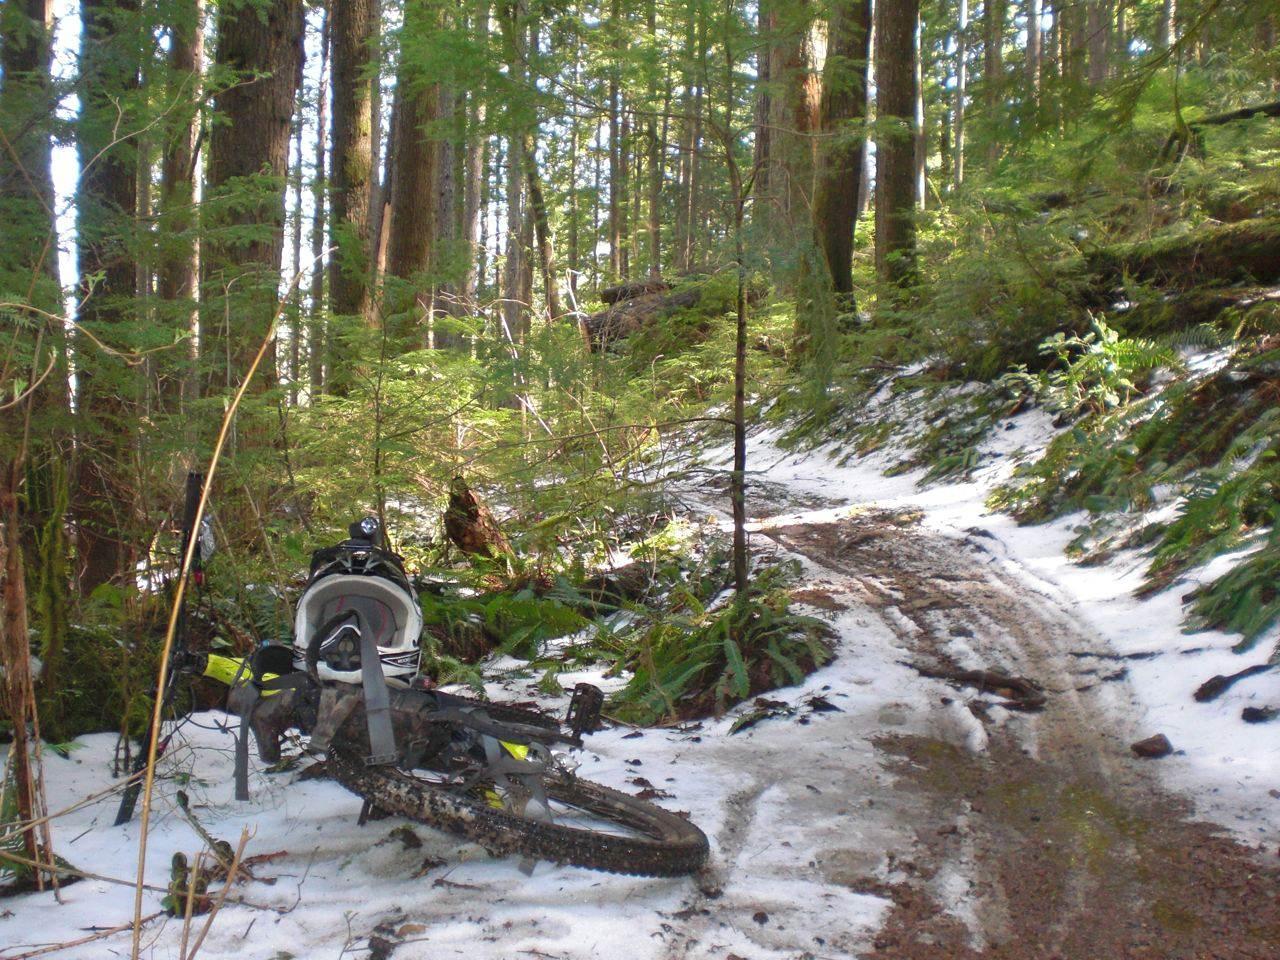 Cumberland Mountain Biking Trails